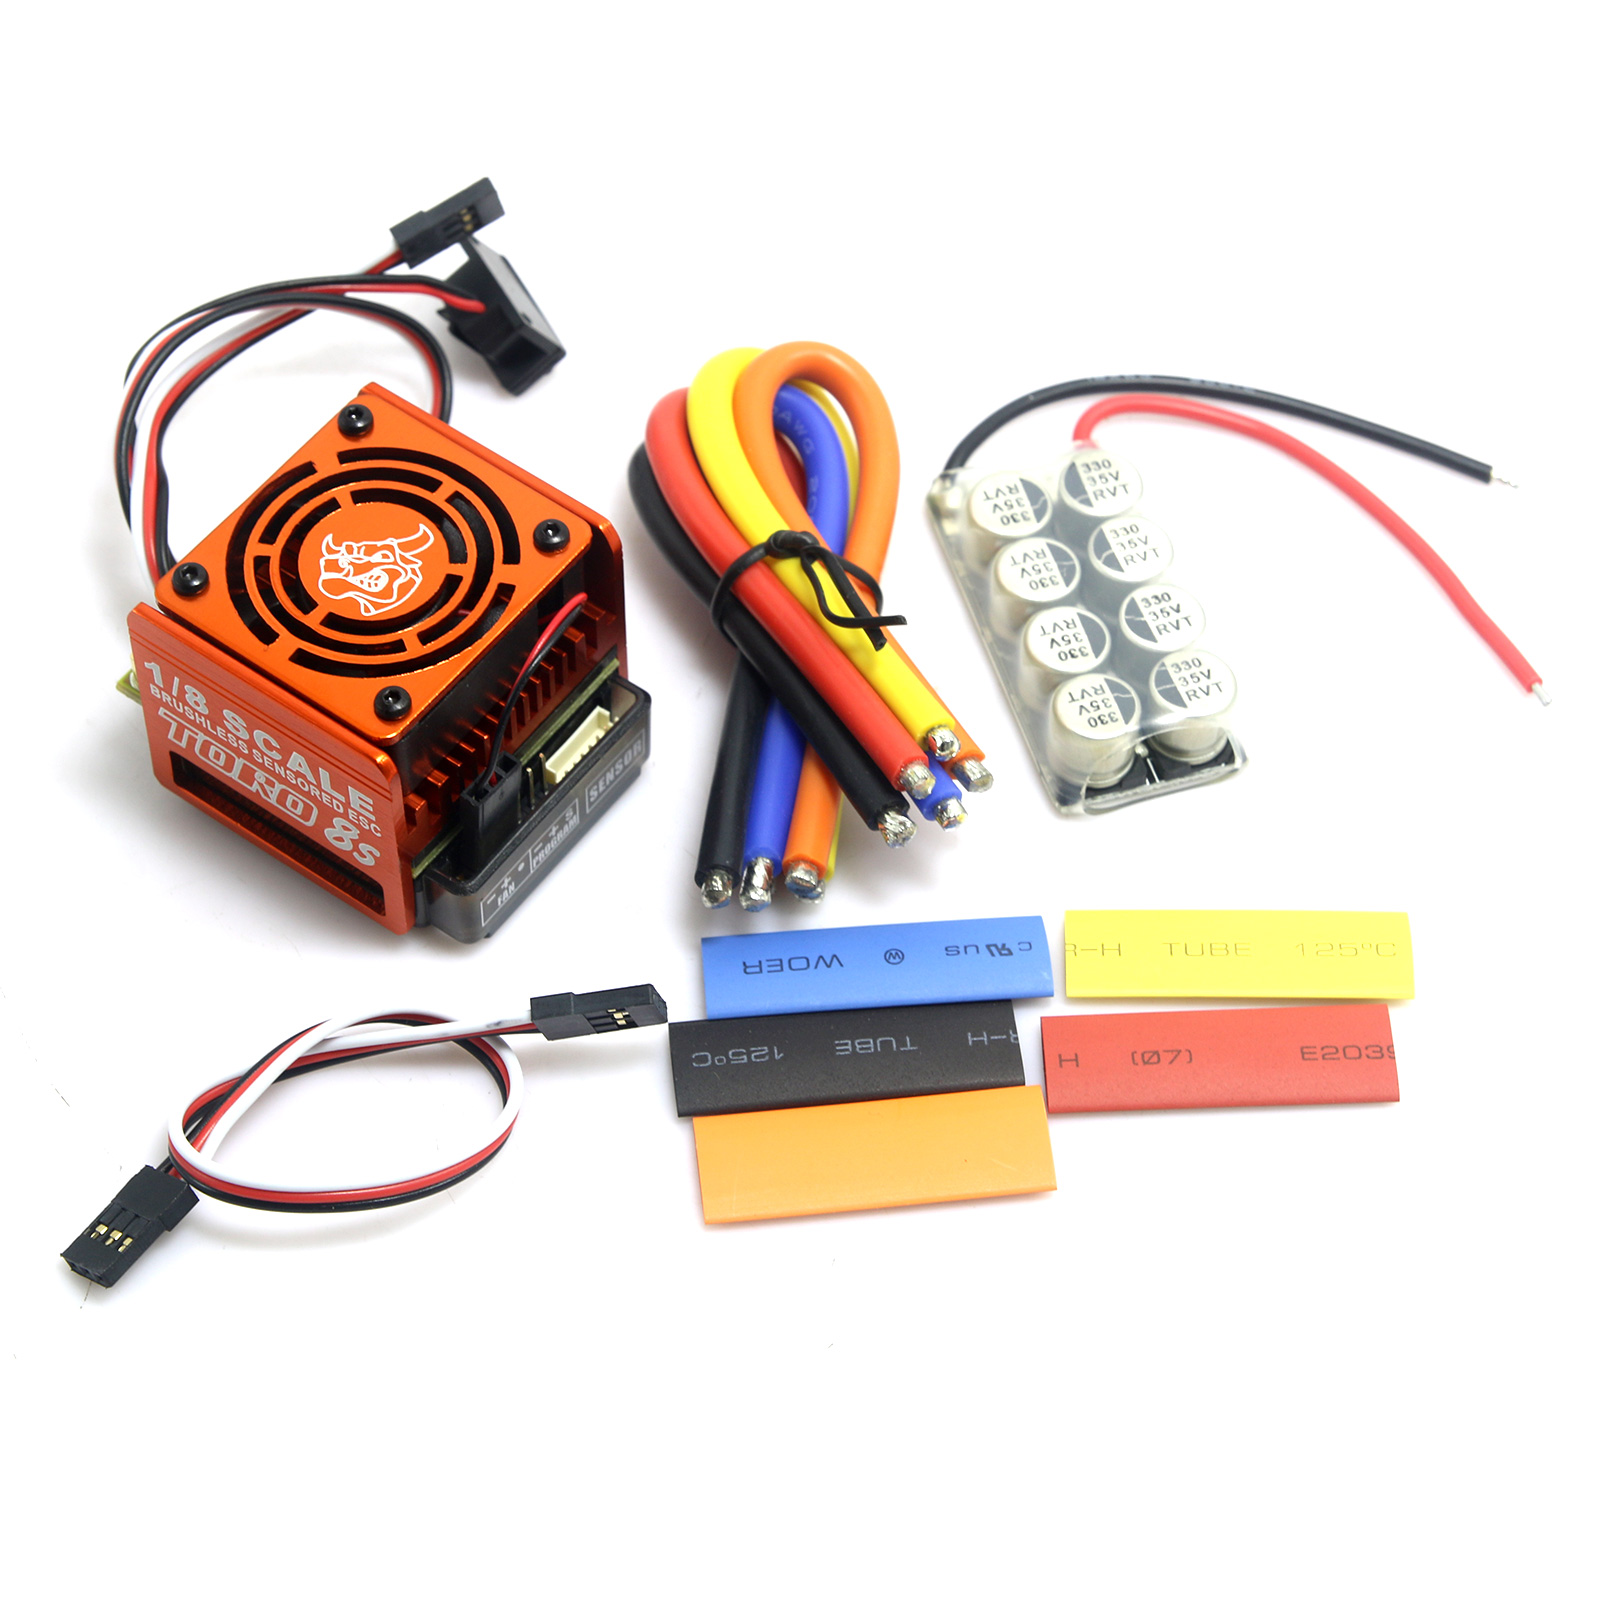 SKYRC Toro 8S 150A Brushless Sensor ESC Electronic Speed Controller for 1 8 RC Cars